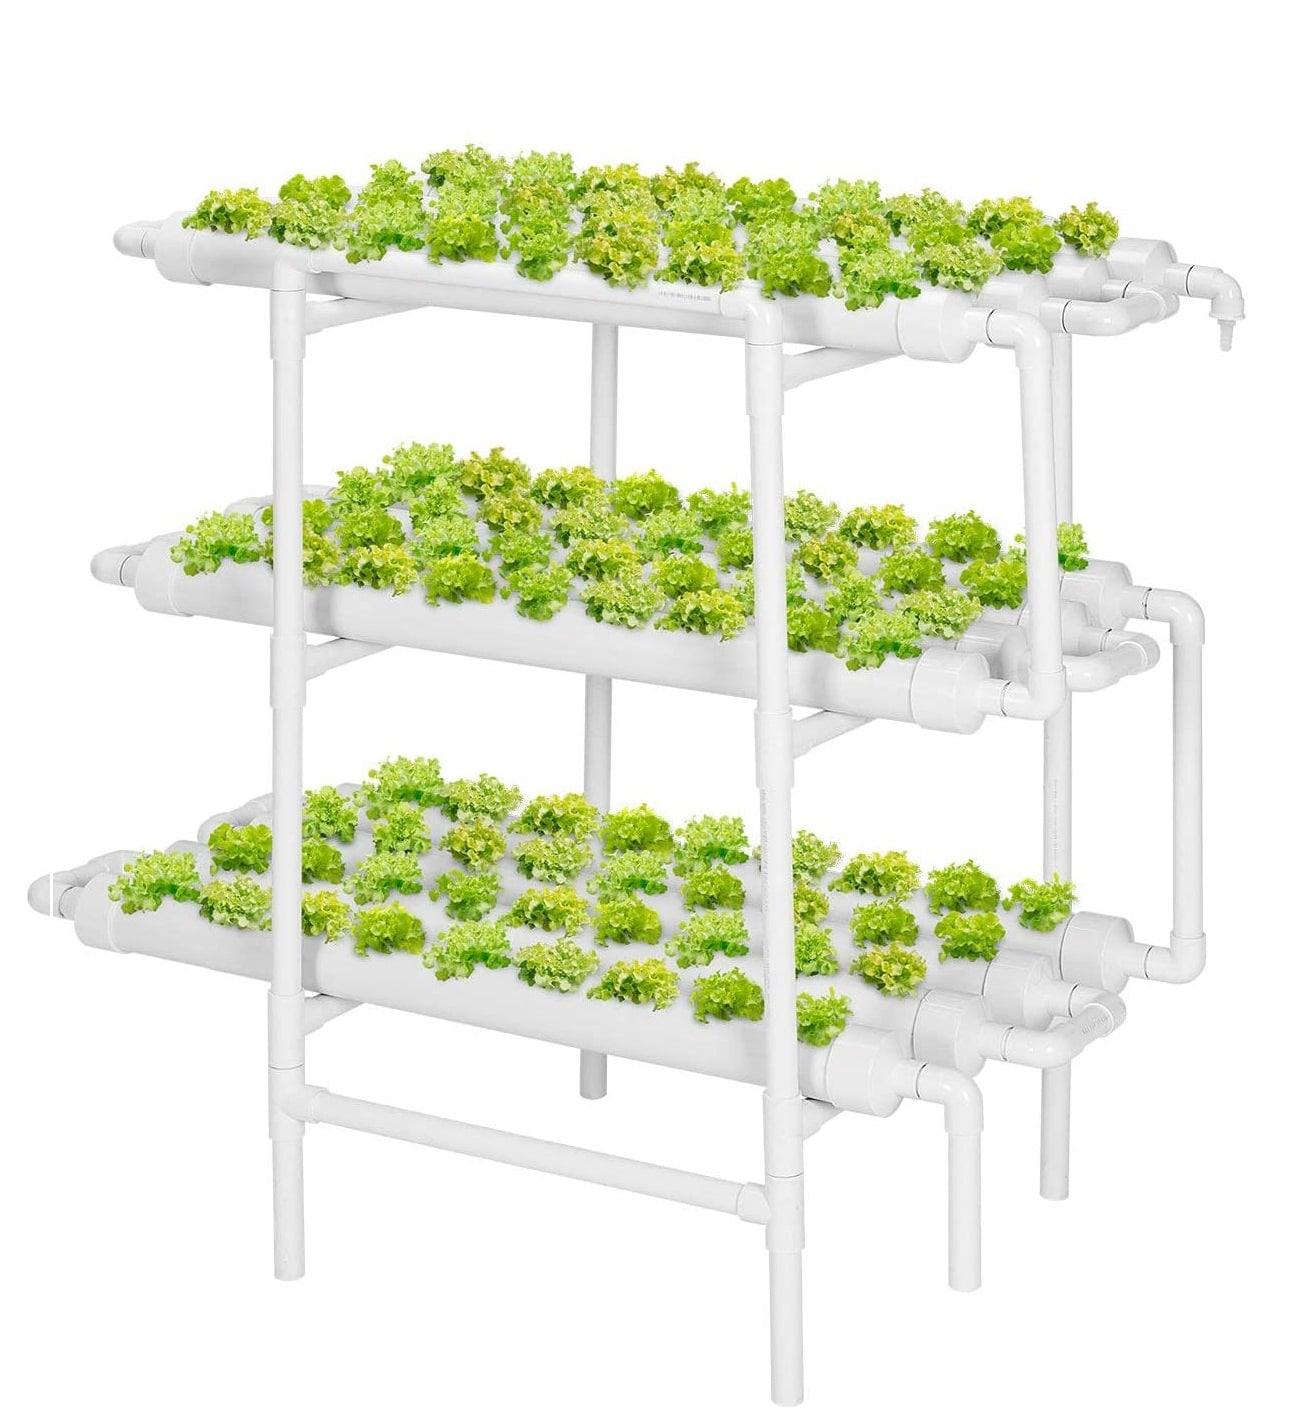 VIVOSUN Hydroponic Grow Kit – Best Thick and Sturdy Option